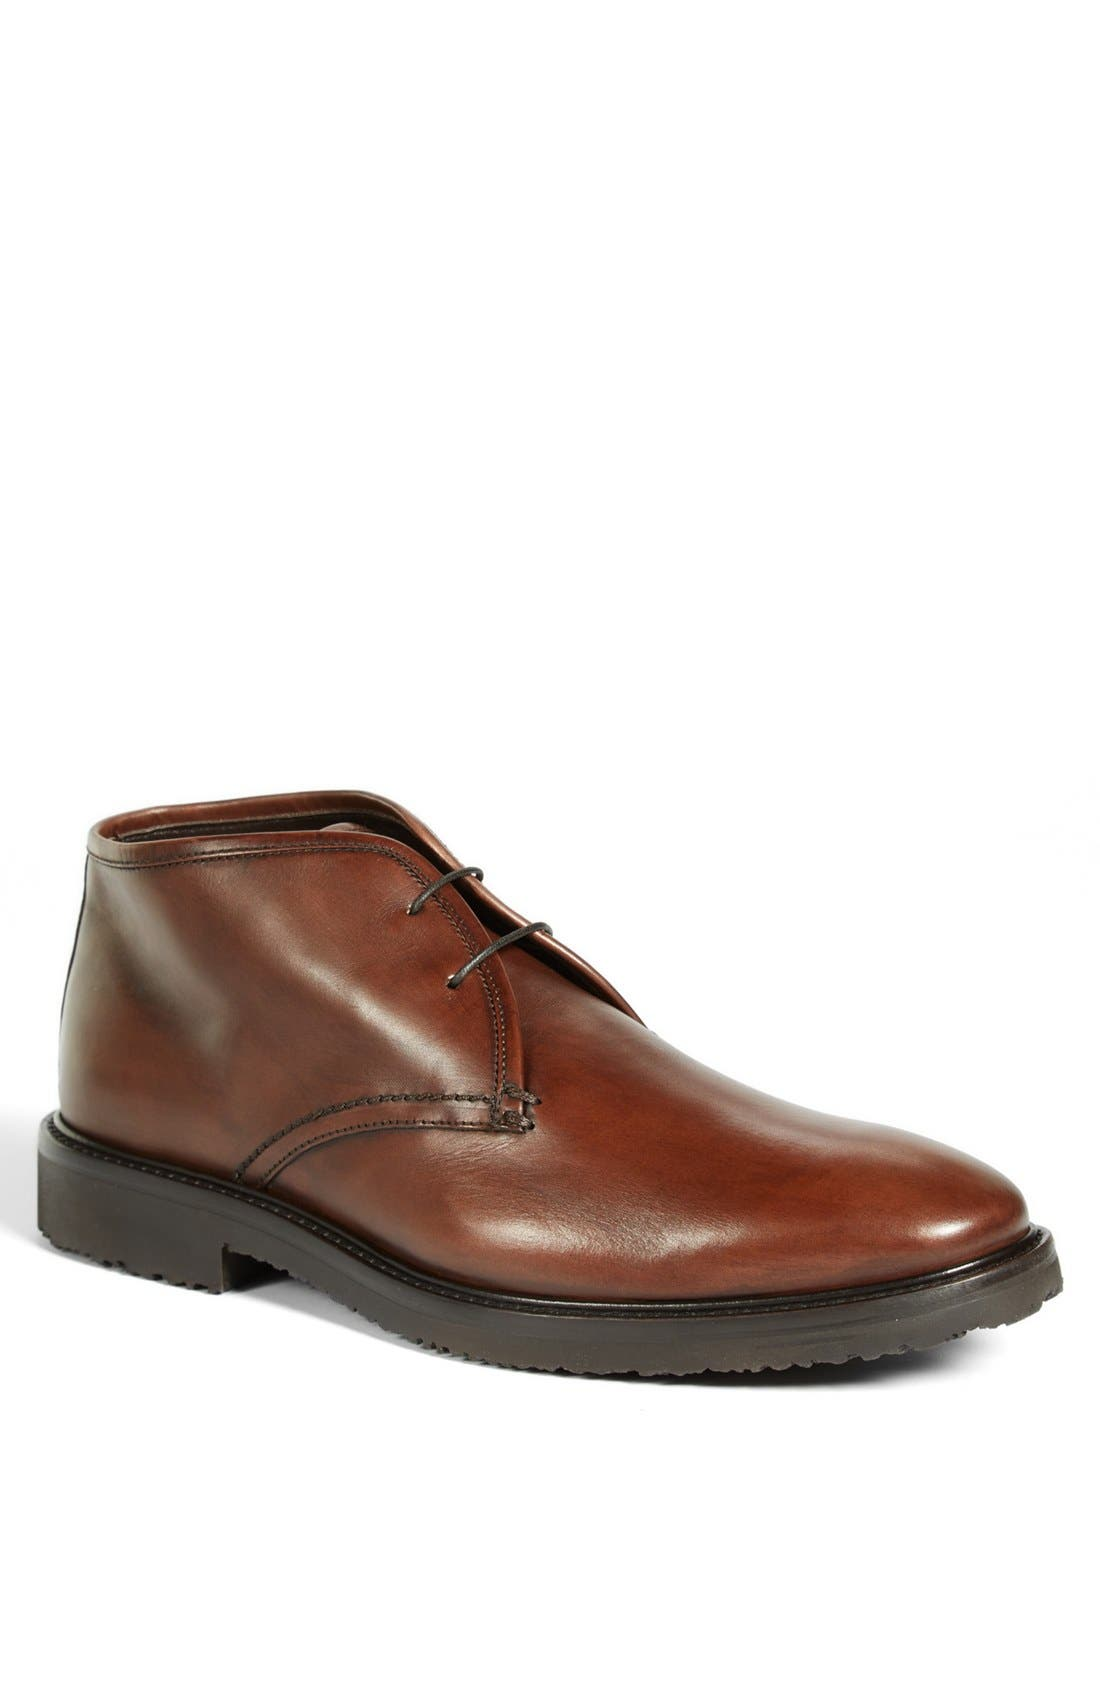 Alternate Image 1 Selected - Ermenegildo Zegna Leather Chukka Boot